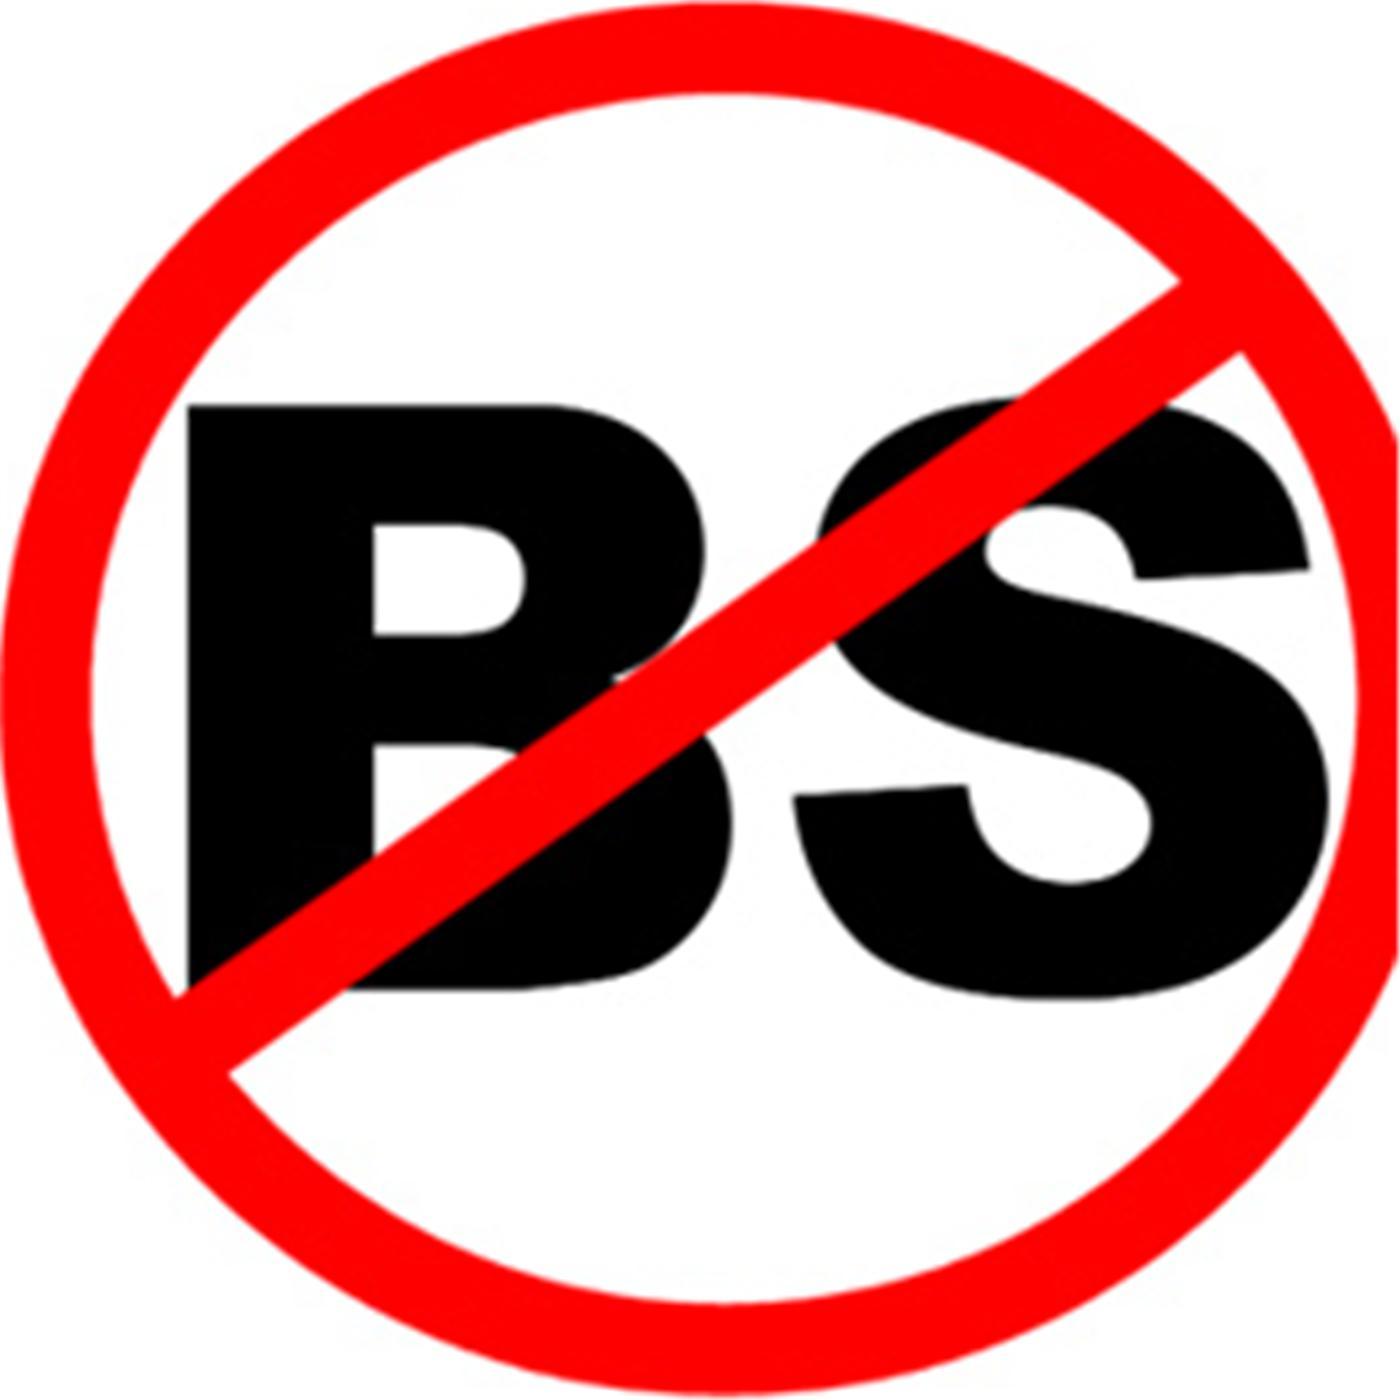 No BS Job Search Advice: Run Your Race! | NoBSJobSearchAdvice.com